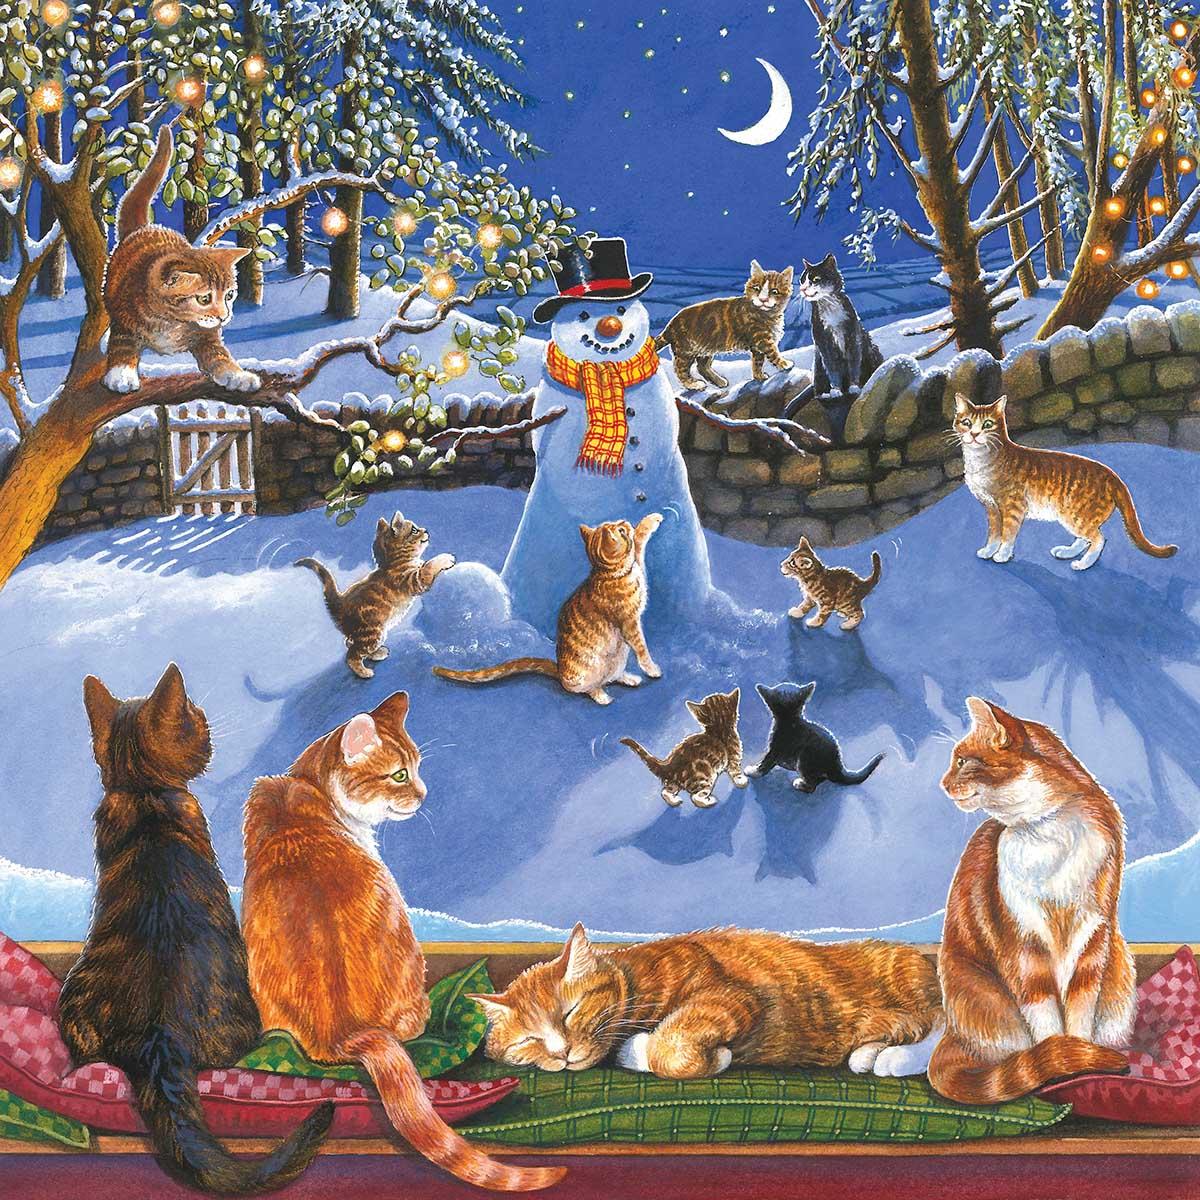 On the Windowsill Cats Jigsaw Puzzle